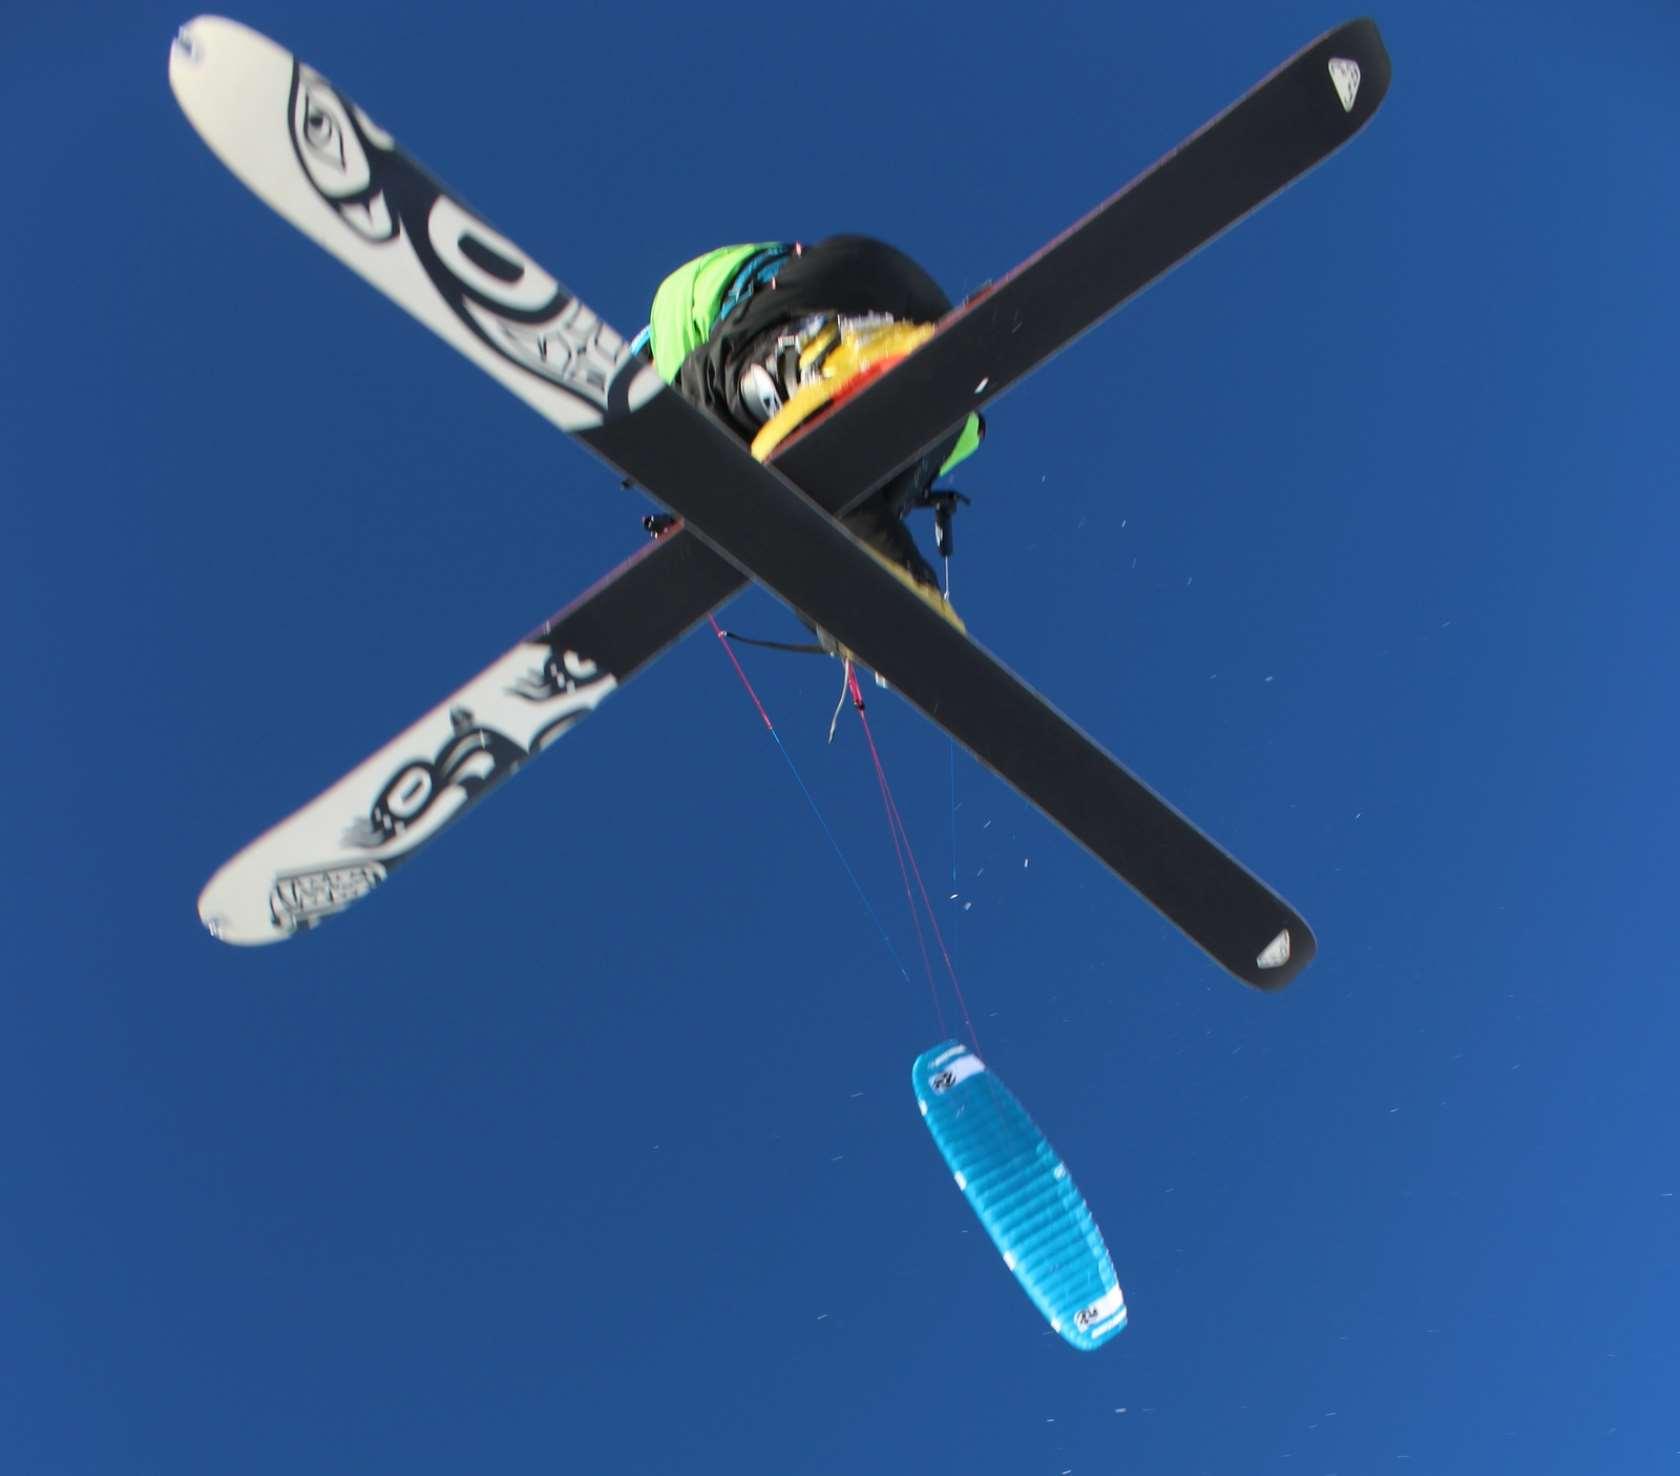 recenze Peter Lynn Nova - snowkiting airstyle